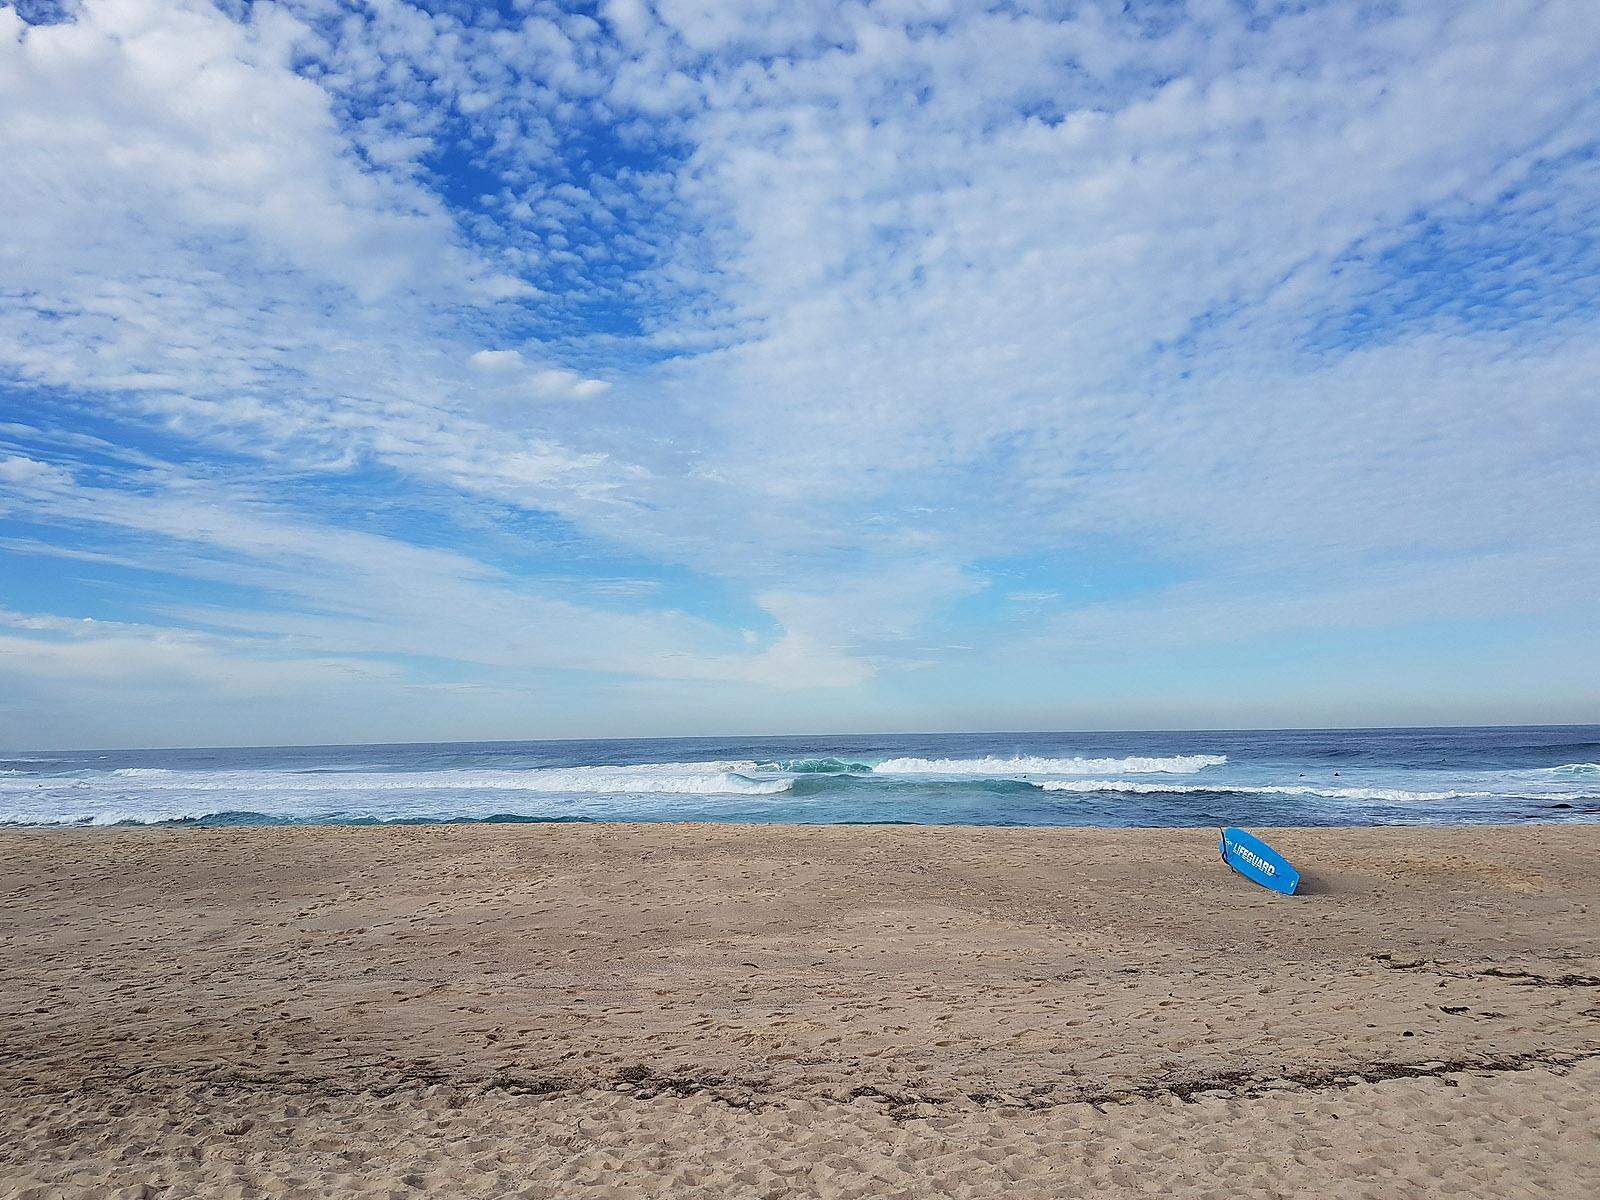 SGMT Australia Sydney_Bondi to Coogee Coastal Walk_20 Bronte Beach Surf Board